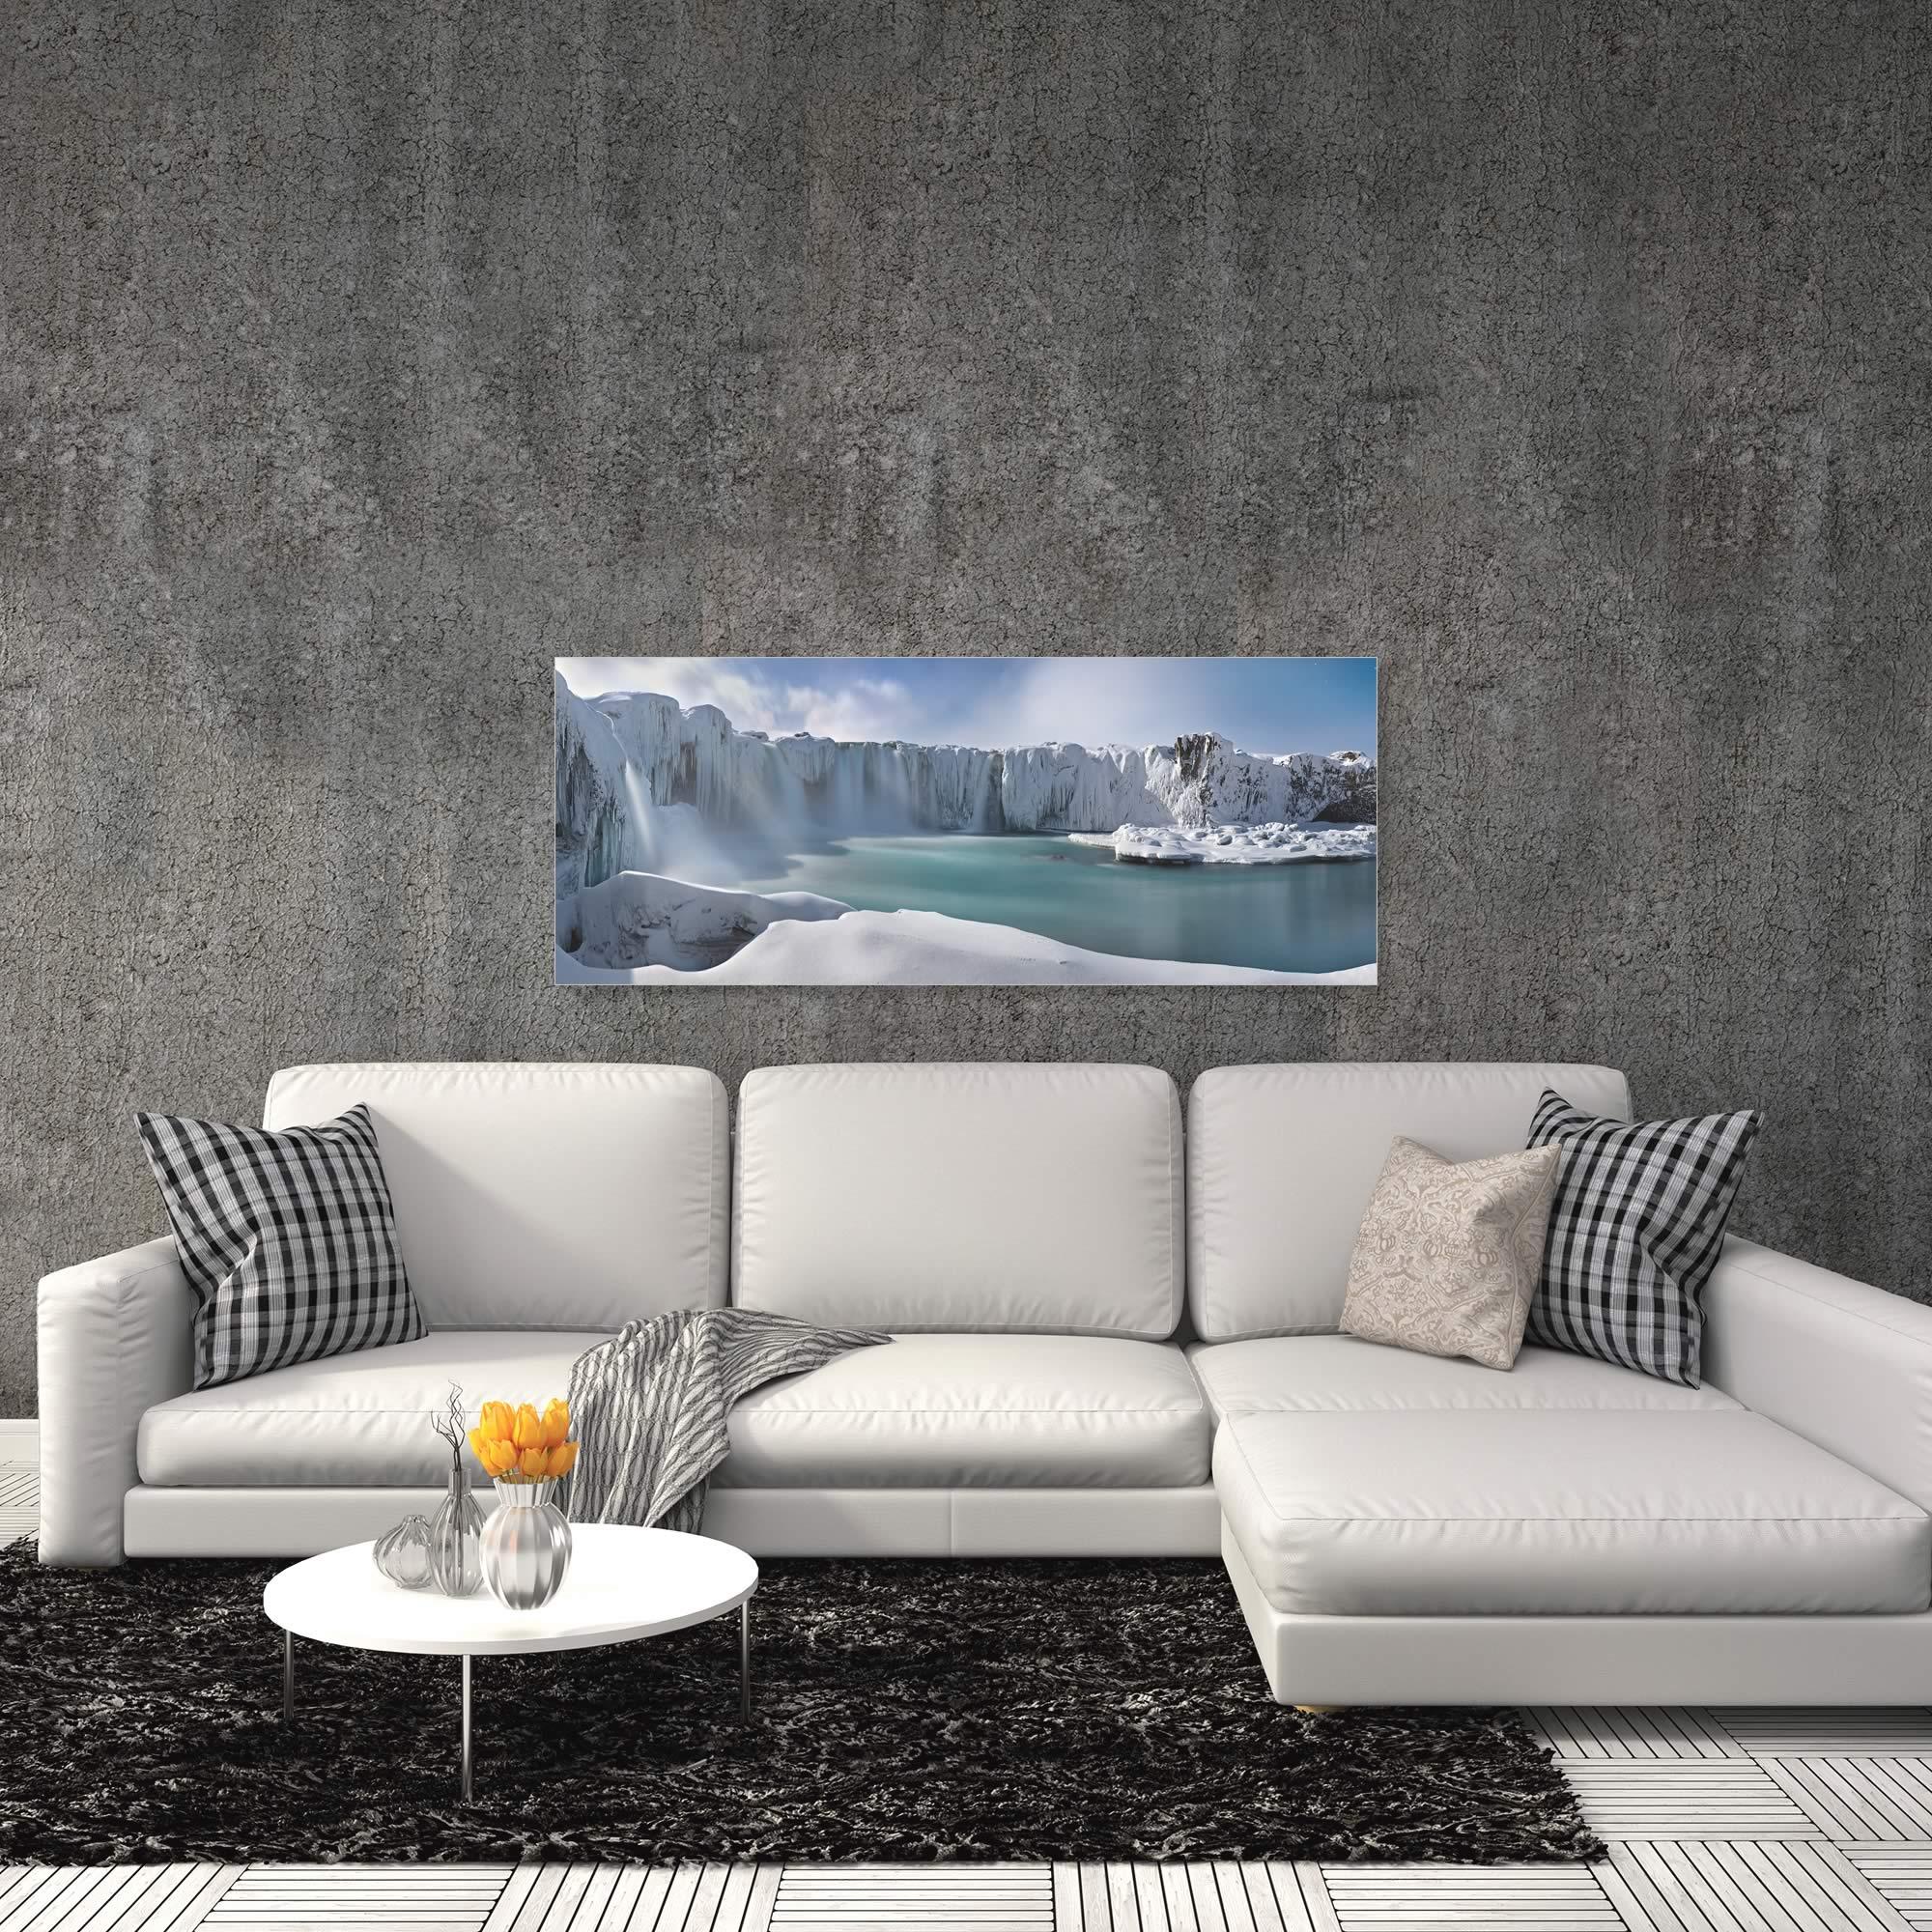 A Dream in the Moonlight by Valeriy Shcherbina - Snowy Landscape Art on Metal or Acrylic - Alternate View 1